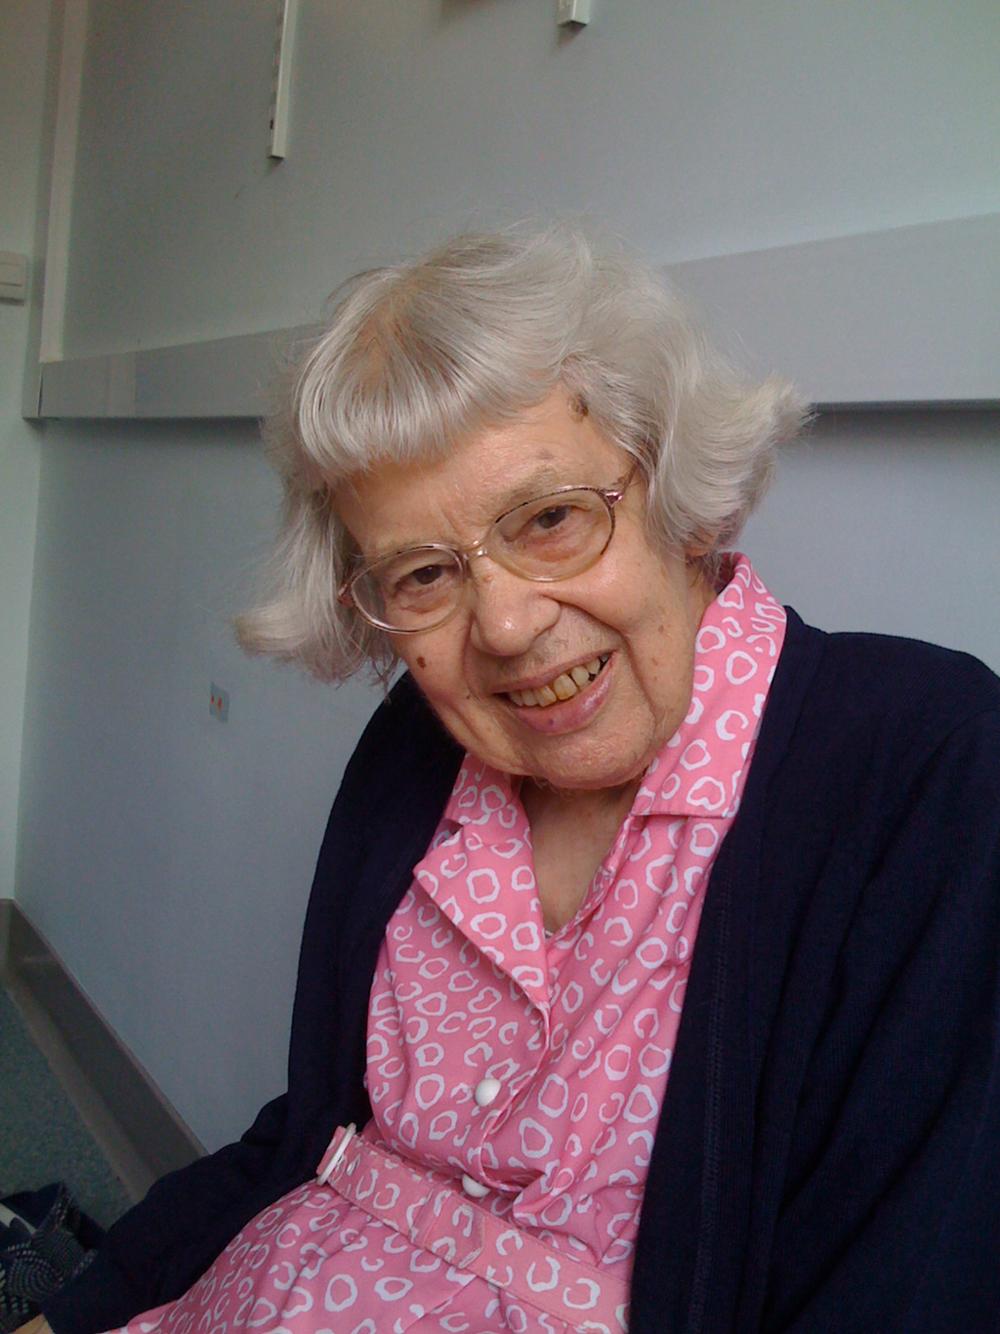 PC: Jane Gitschier, PLoS Genetics